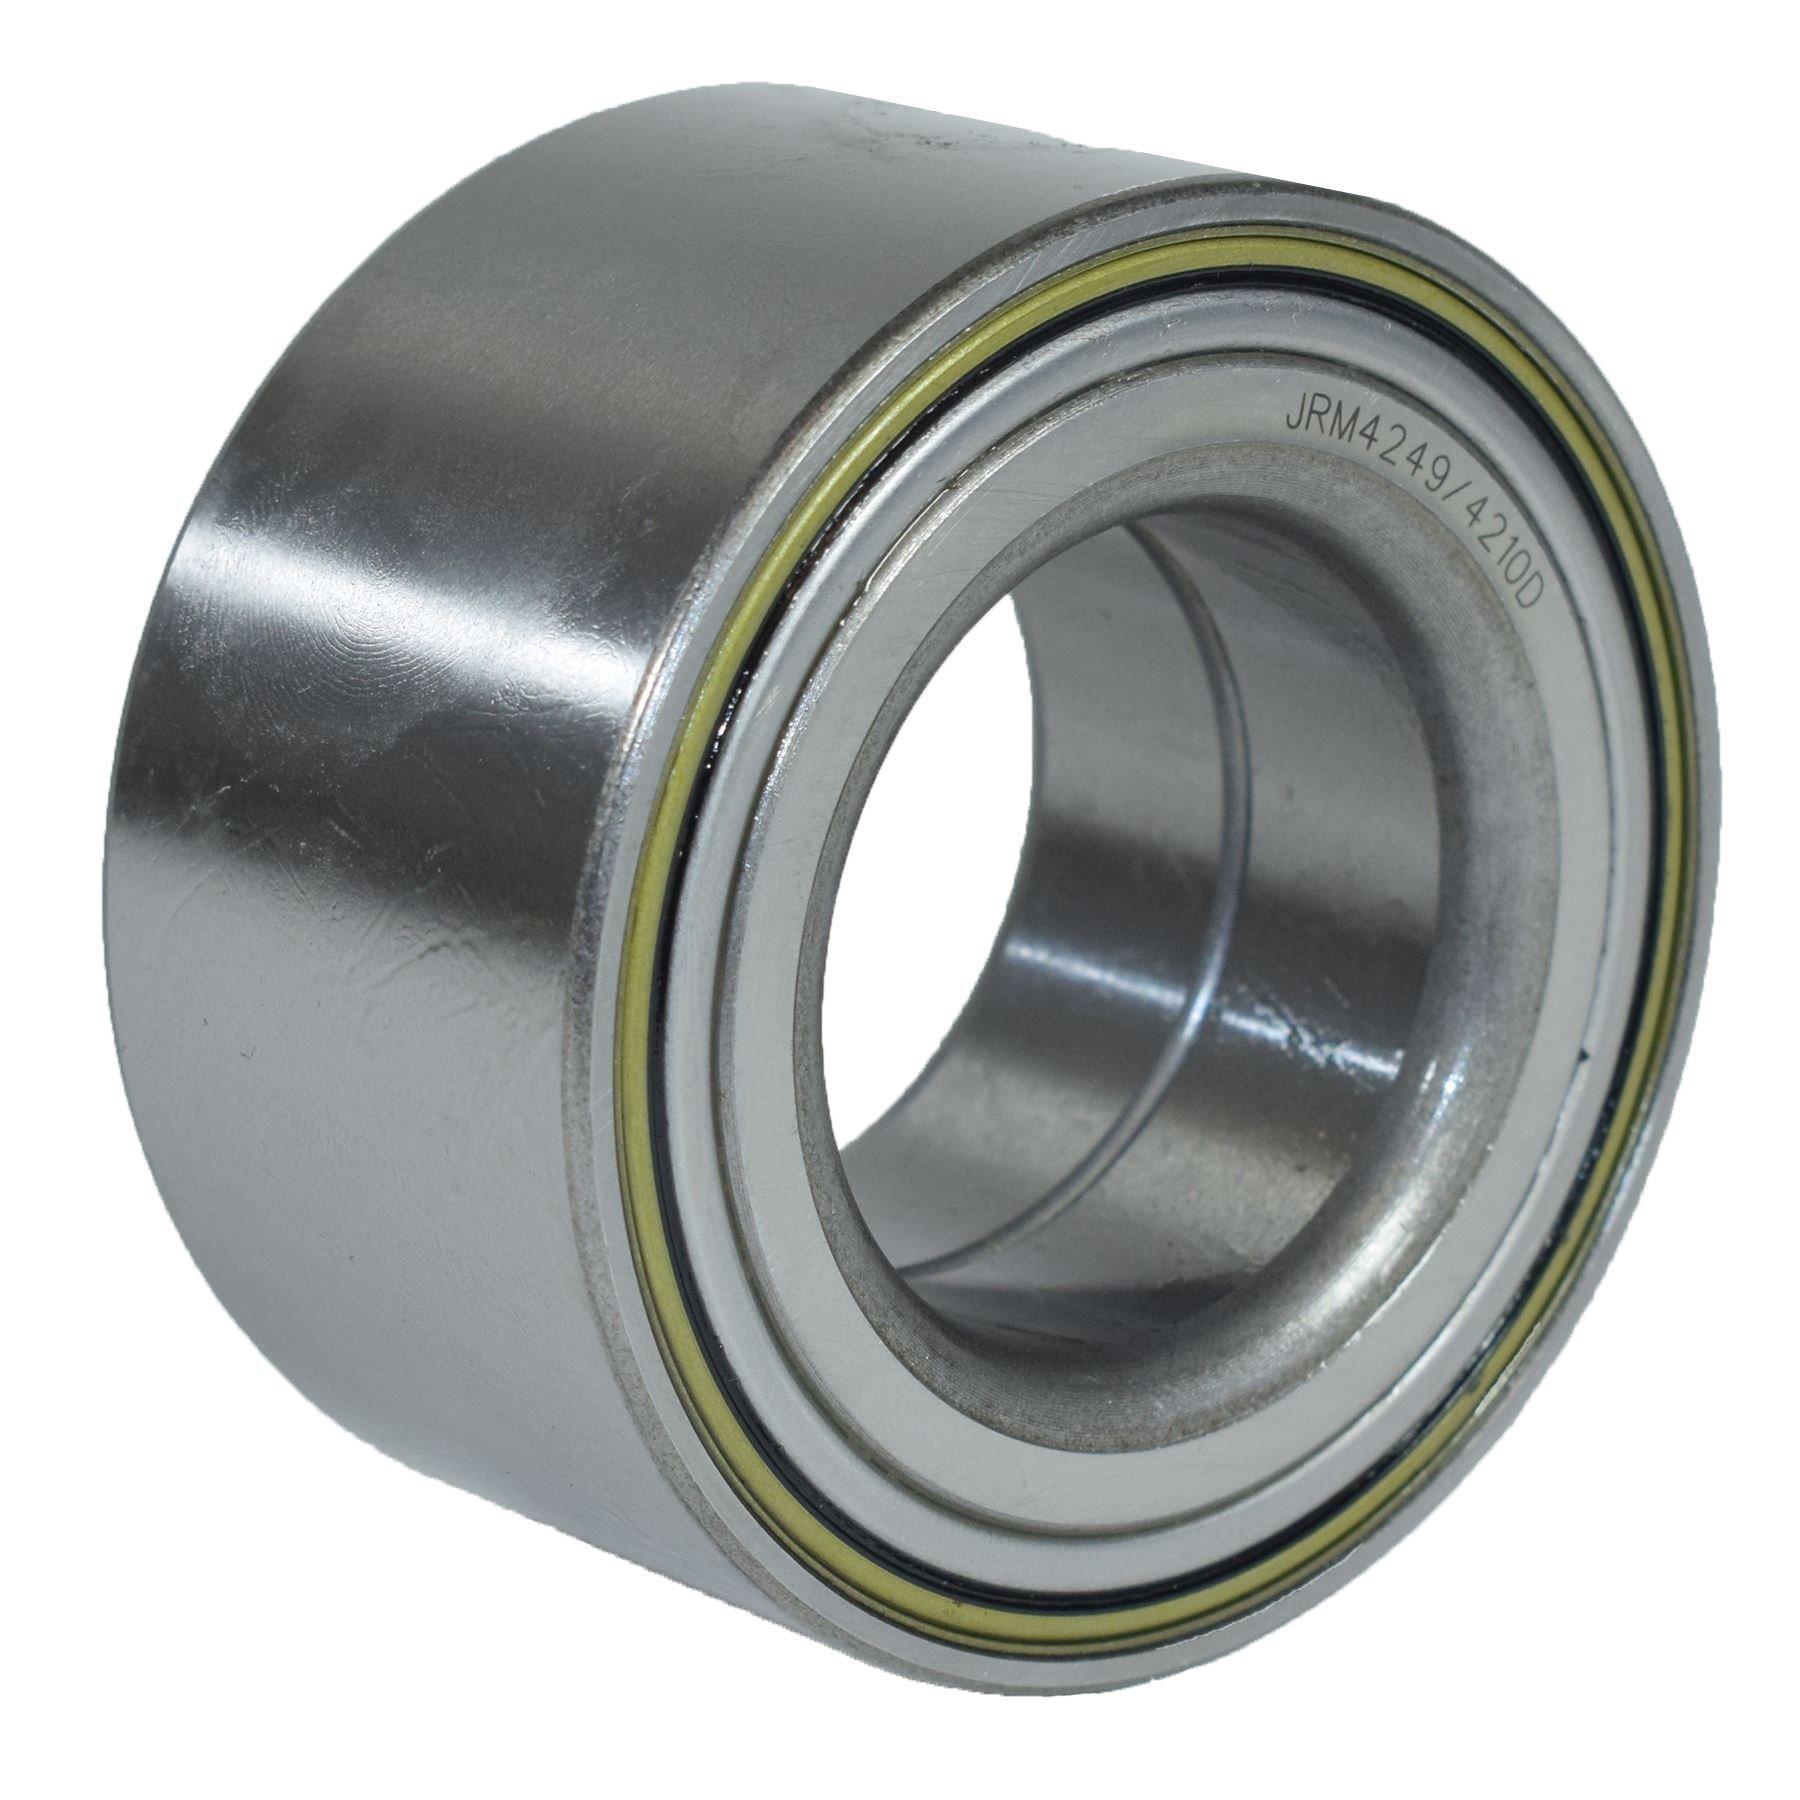 AB Tools Trailers Ifor Williams Sealed Wheel Hub Bearings P00002 ID42 x OD76 x W39mm by AB Tools